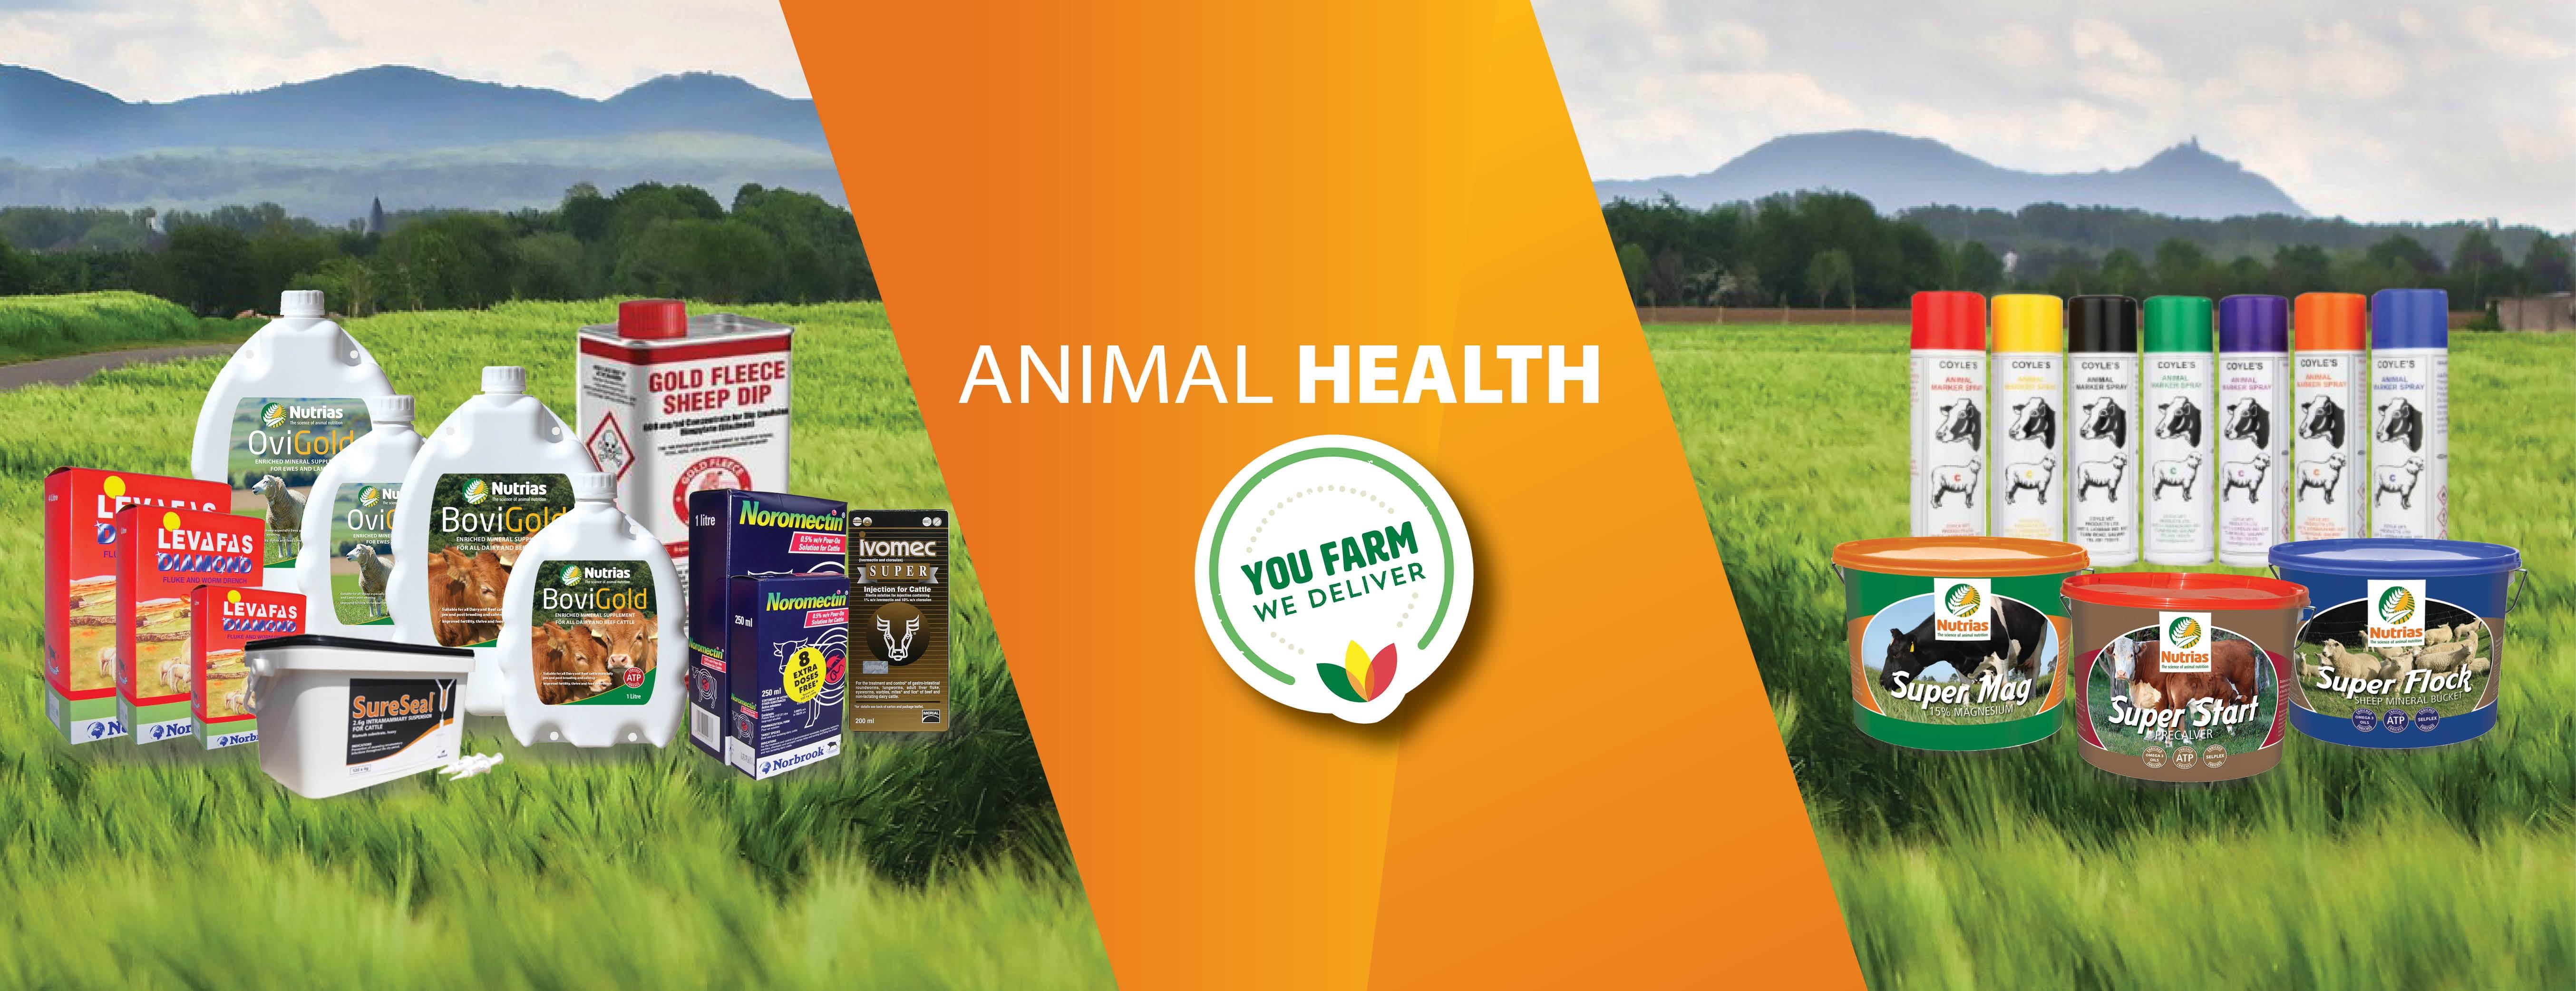 Animal-Health